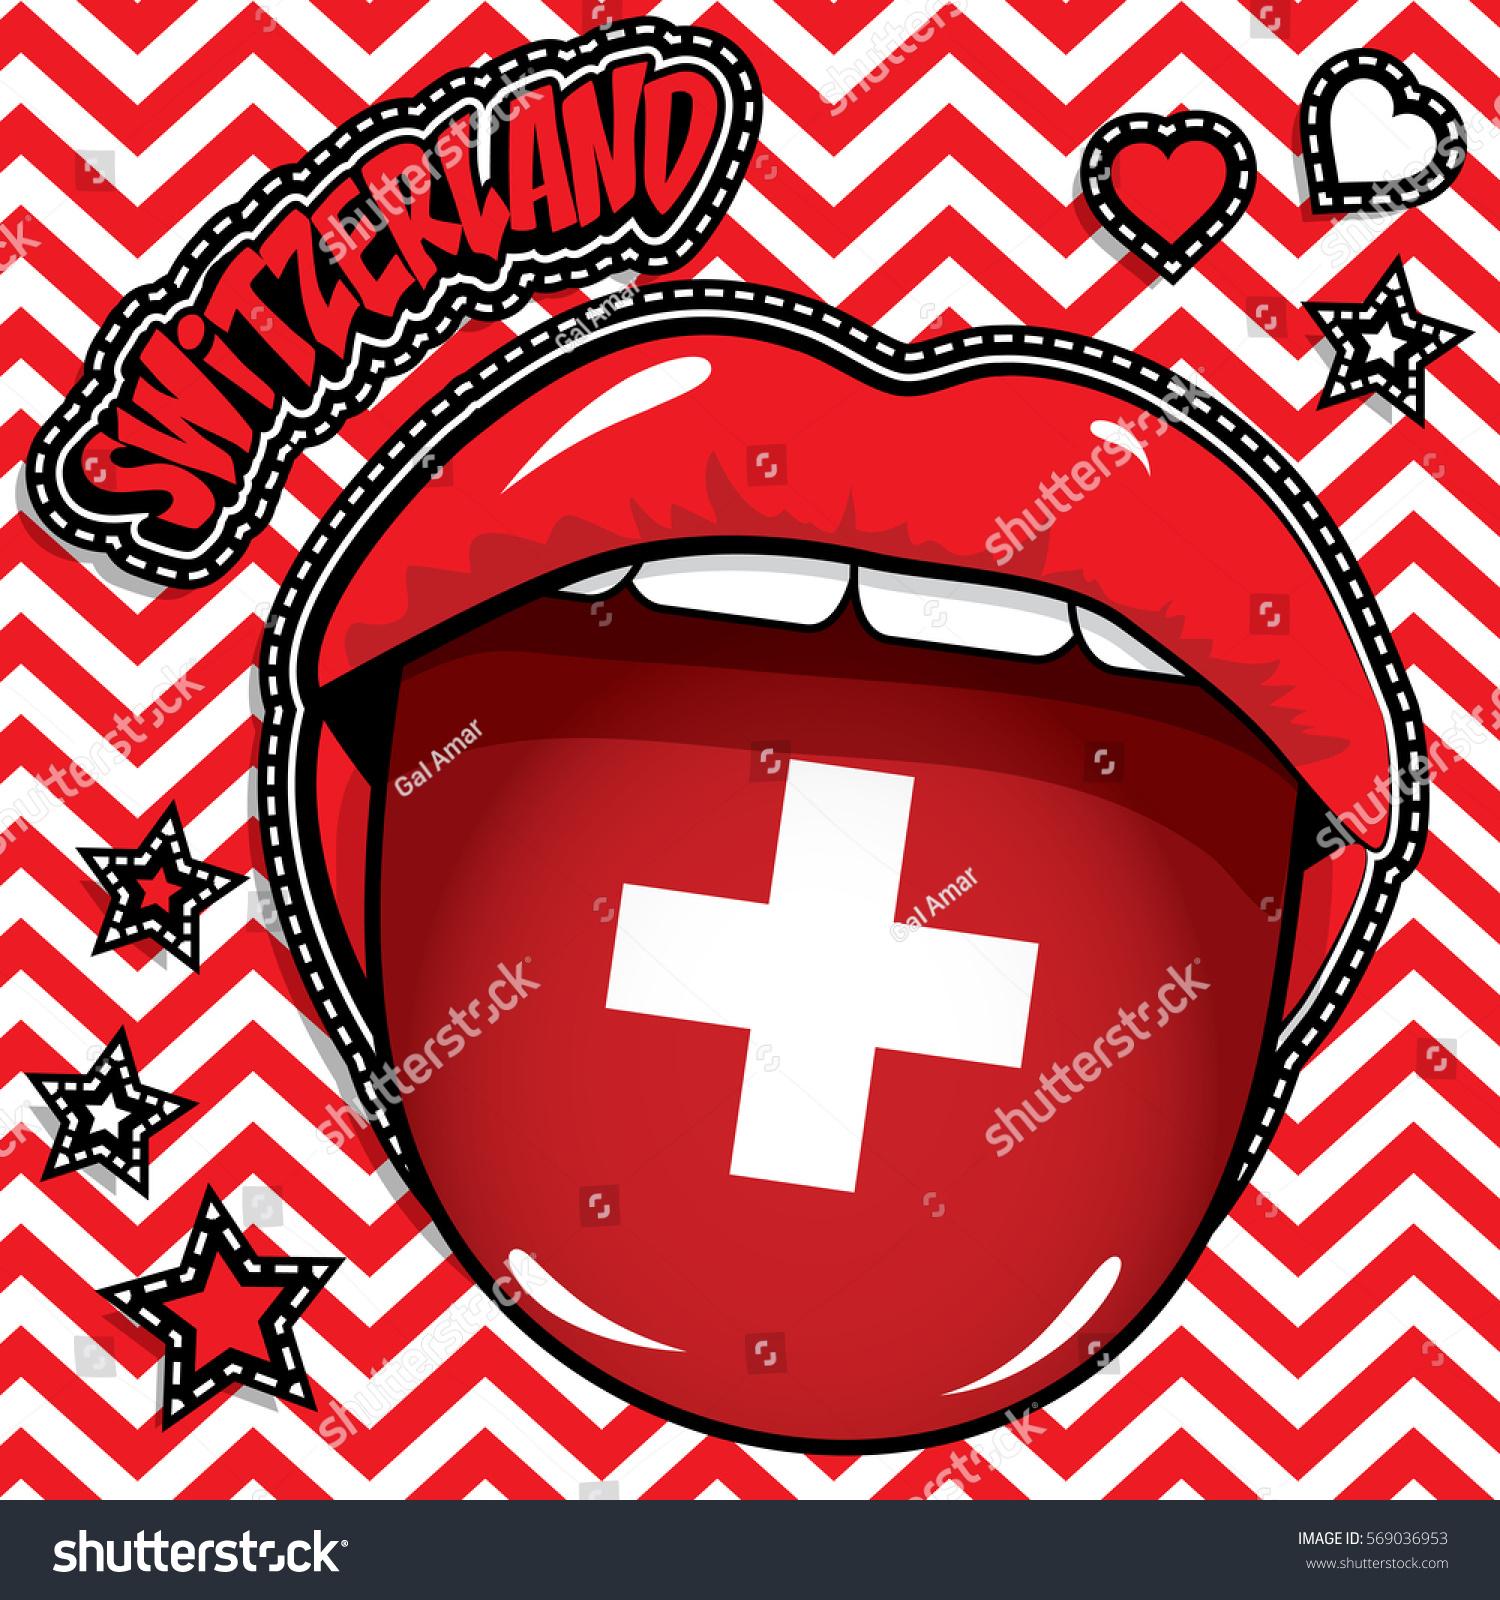 Happy Birthday Switzerland Pop Art y Stock Vector